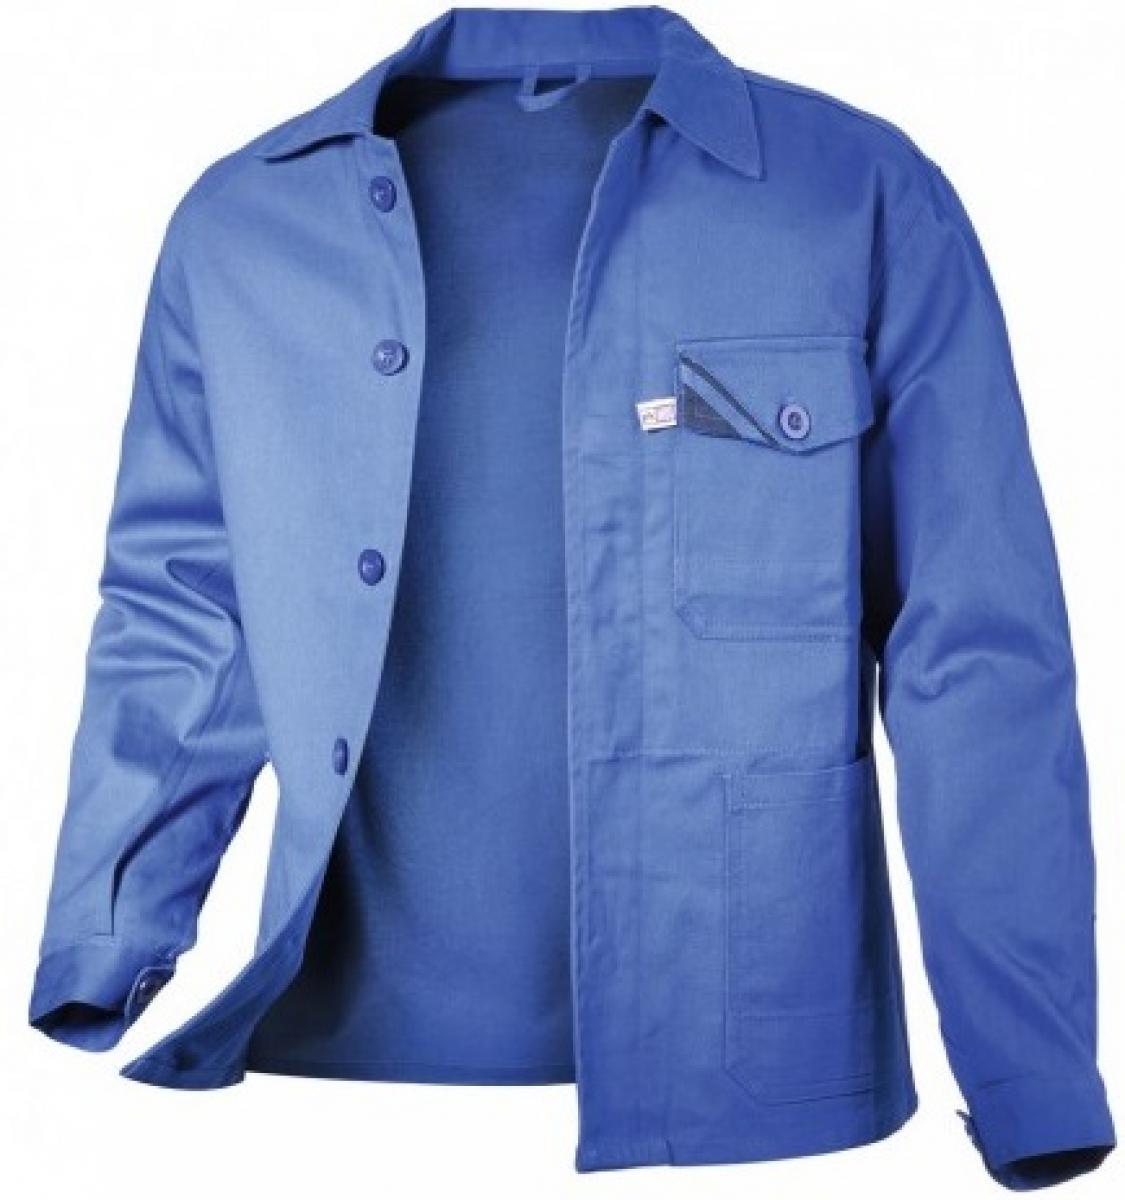 PKA-Arbeits-Berufs-Bund-Jacke, Basic Plus, BW270, kornblau